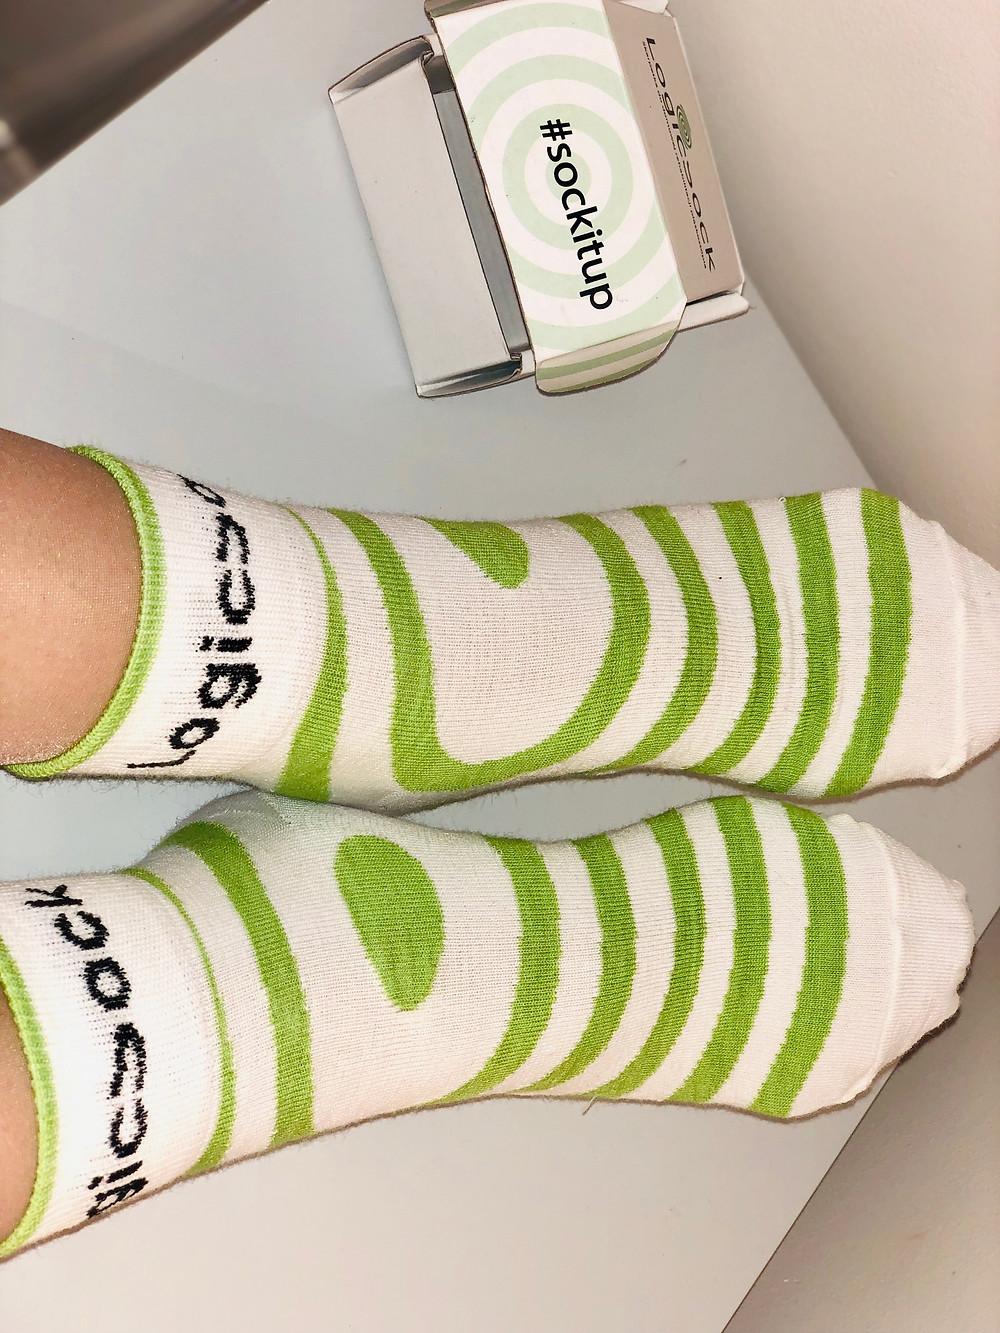 Flat Feet correction socks on the patient's feet